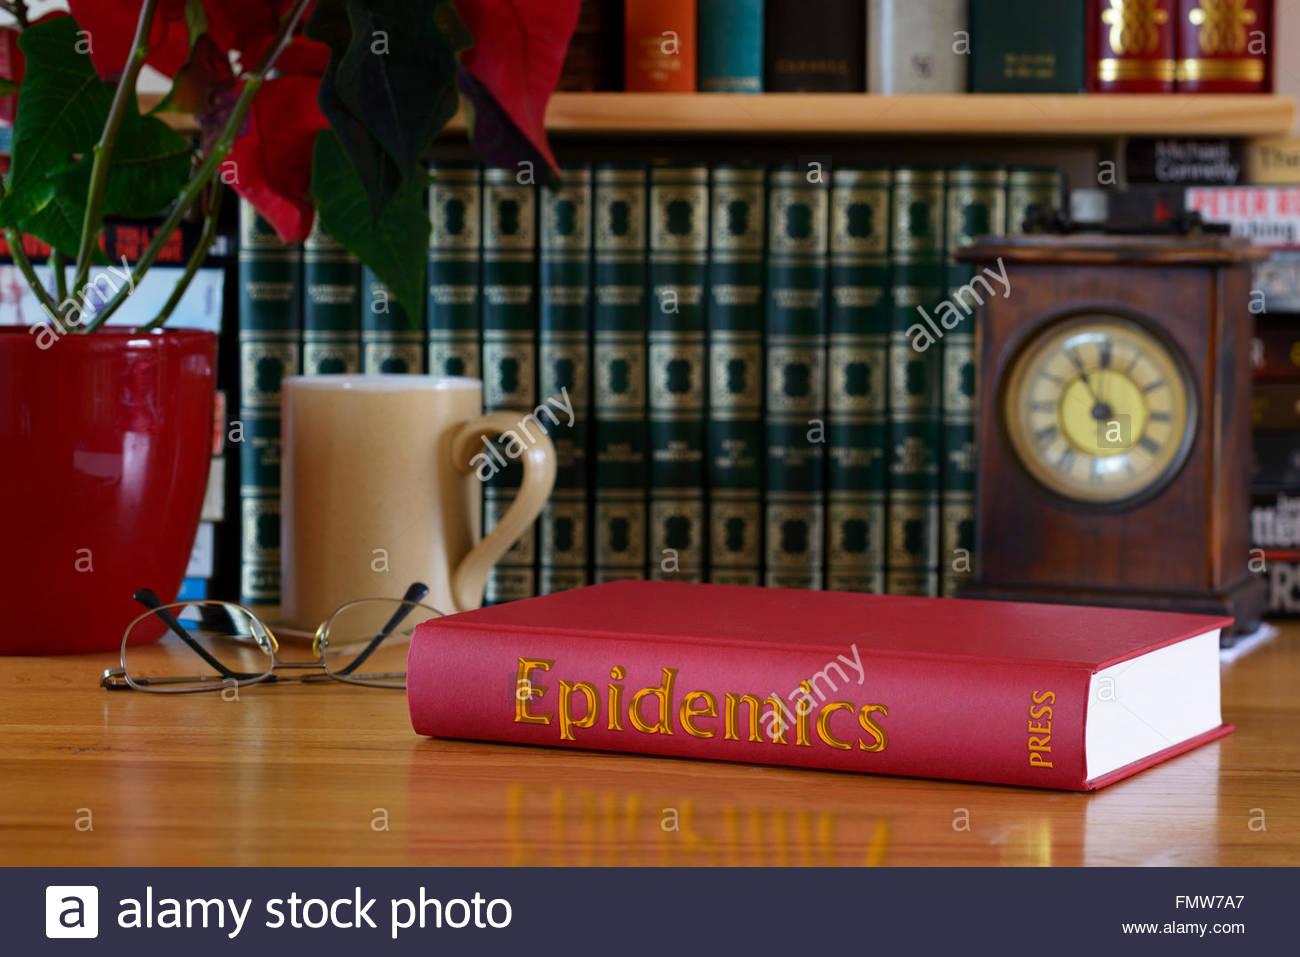 Epidemics book on study desk, Dorset, England, Britain, UK - Stock Image